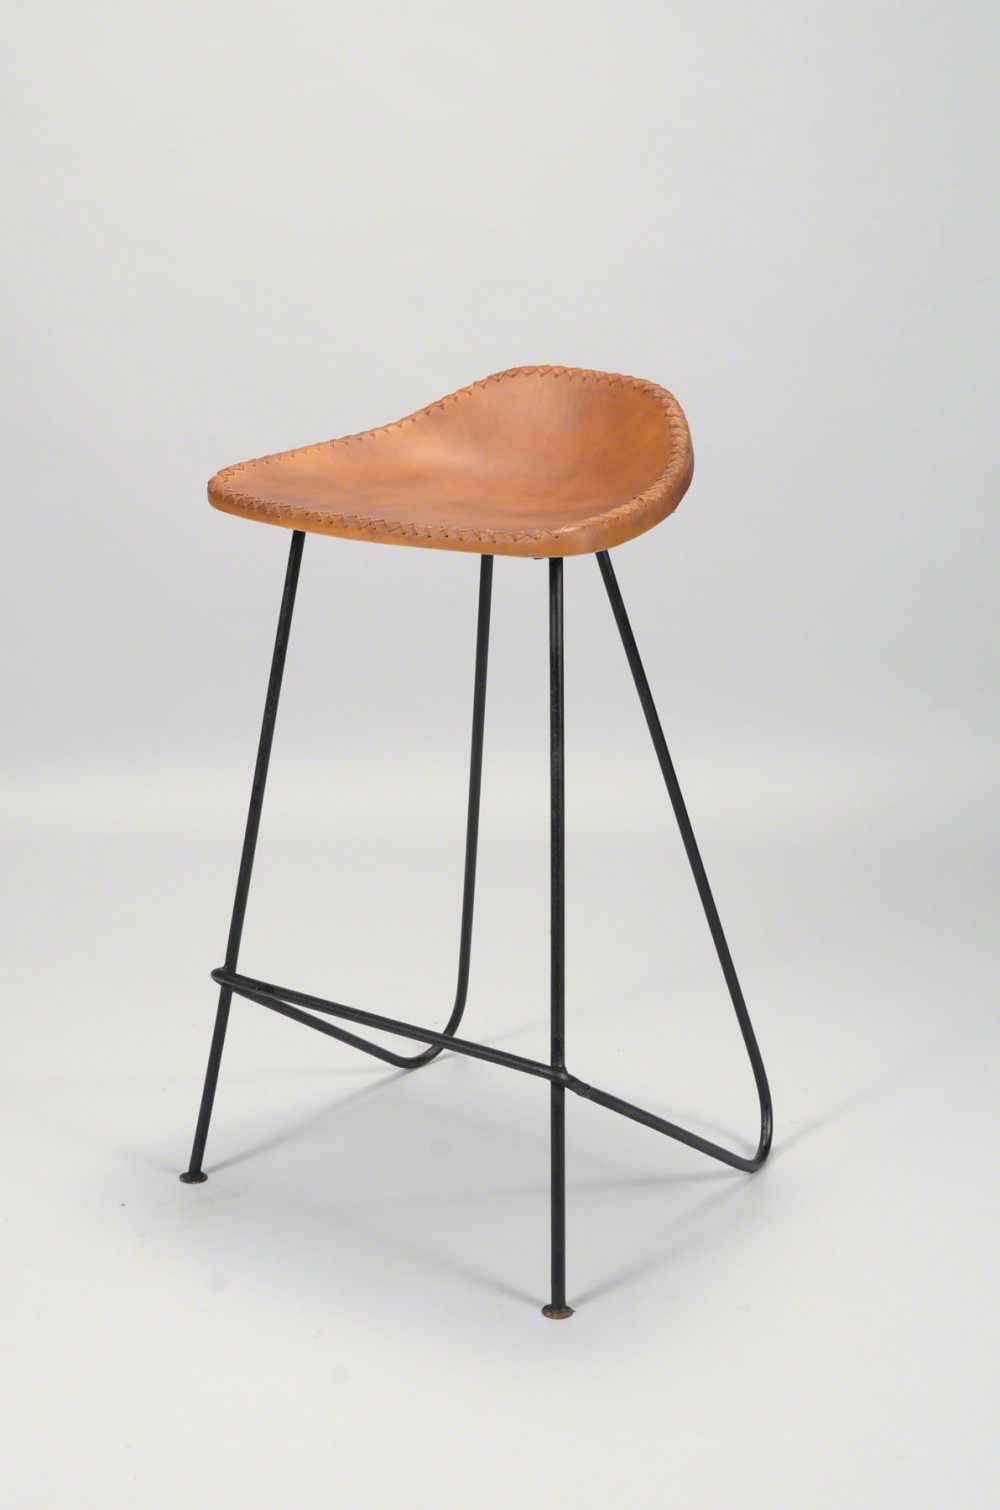 barhocker industrie hocker metall industriedesign sitzh he 68 cm. Black Bedroom Furniture Sets. Home Design Ideas